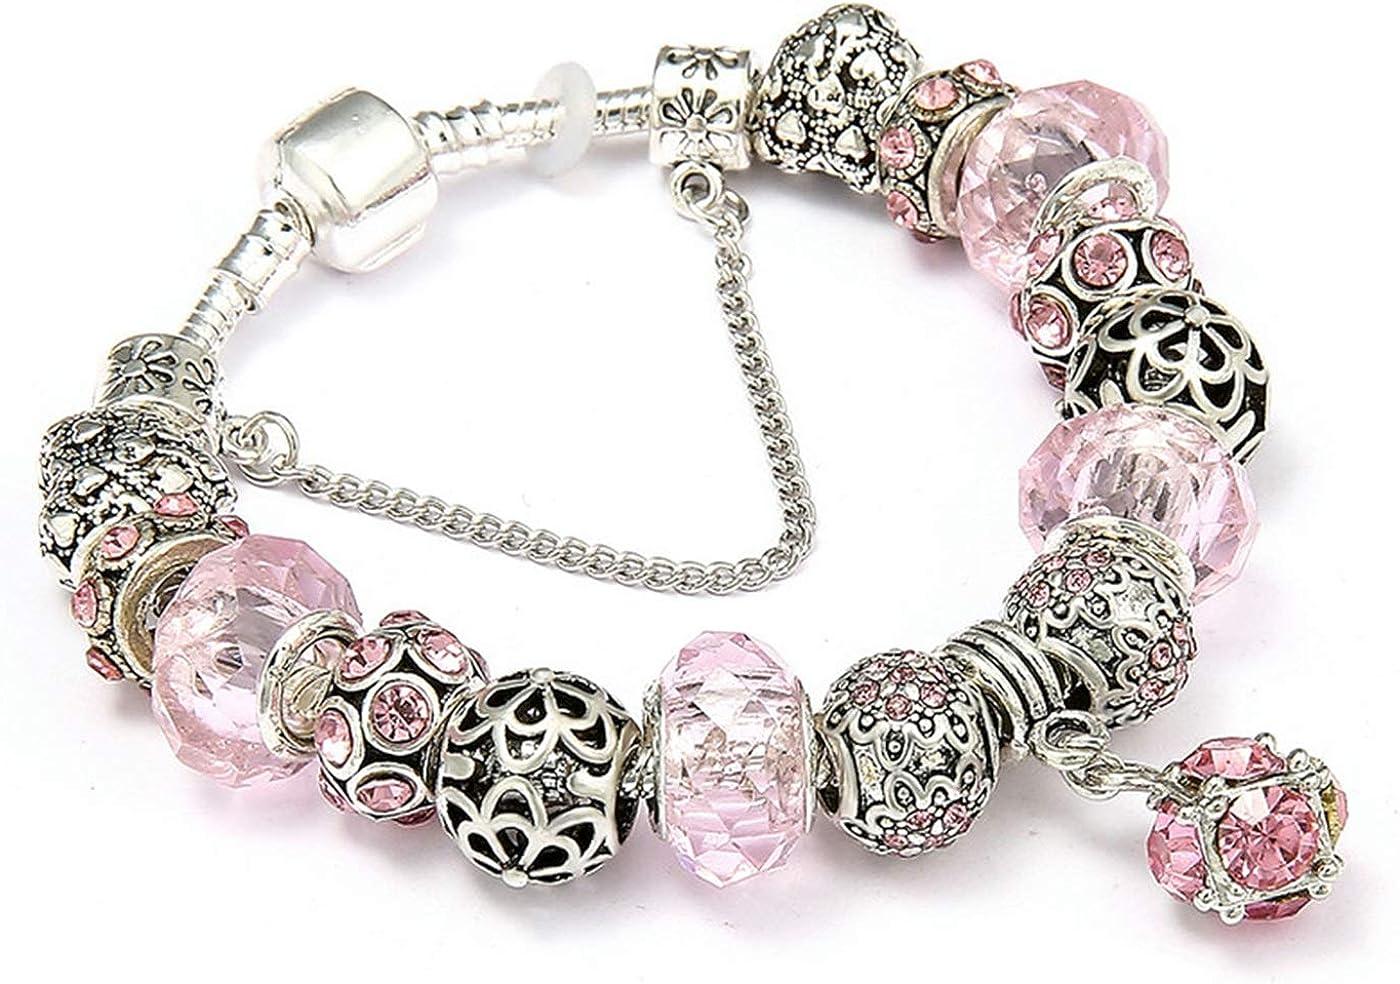 PmseK Pulsera de Moda,Pulsera de Curación Luxury Dropshipping AAA Zircon Charm Bracelet For Women Fit Brand Bracelet Jewelry DIY Making Accessories Gifts